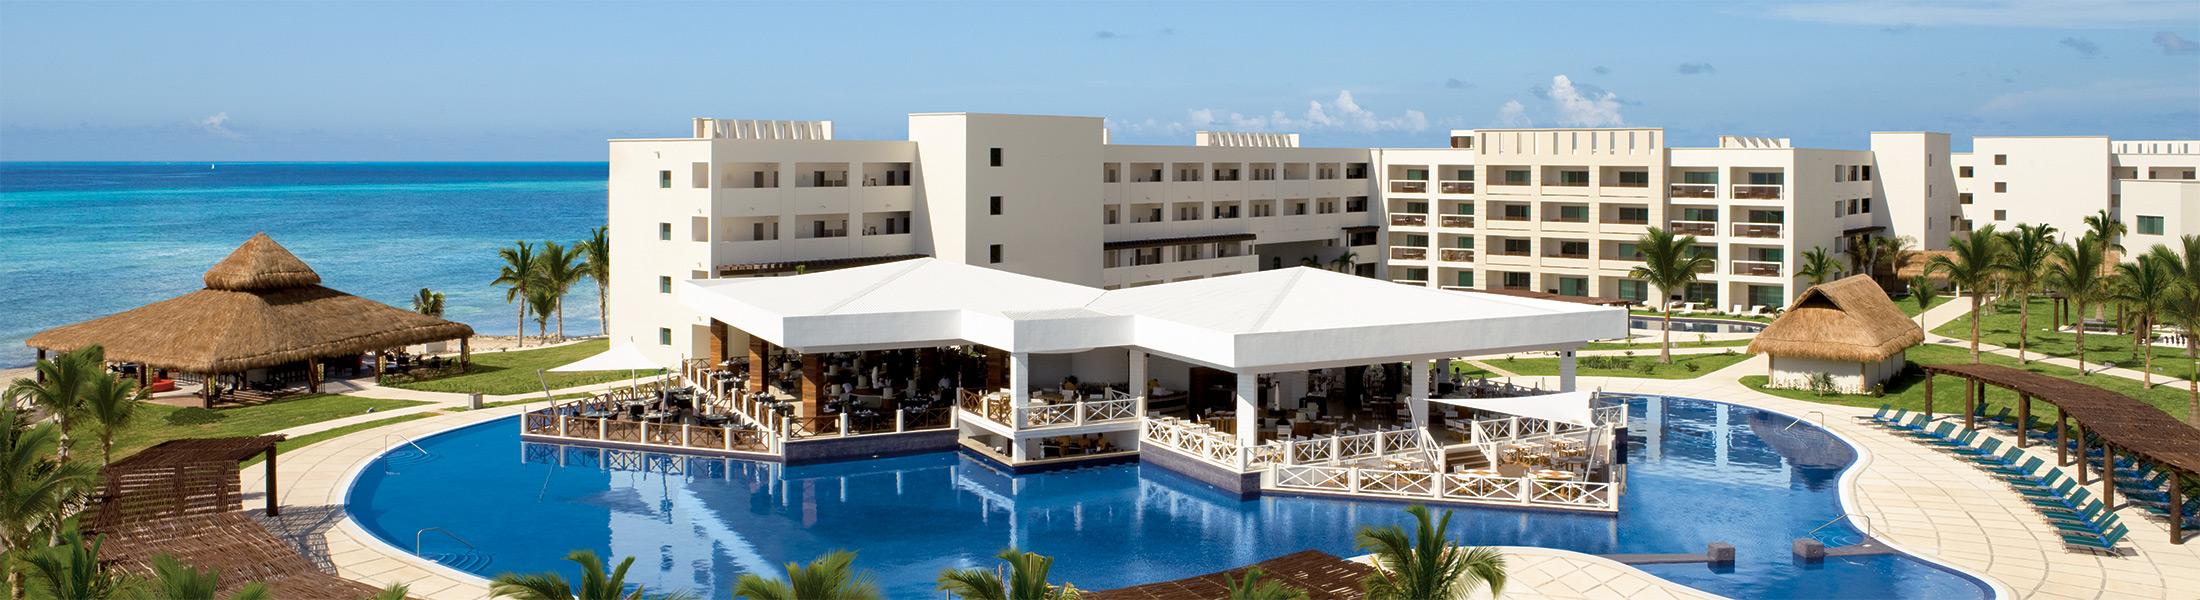 Aerial view of Secrets Silversands Riviera Resort